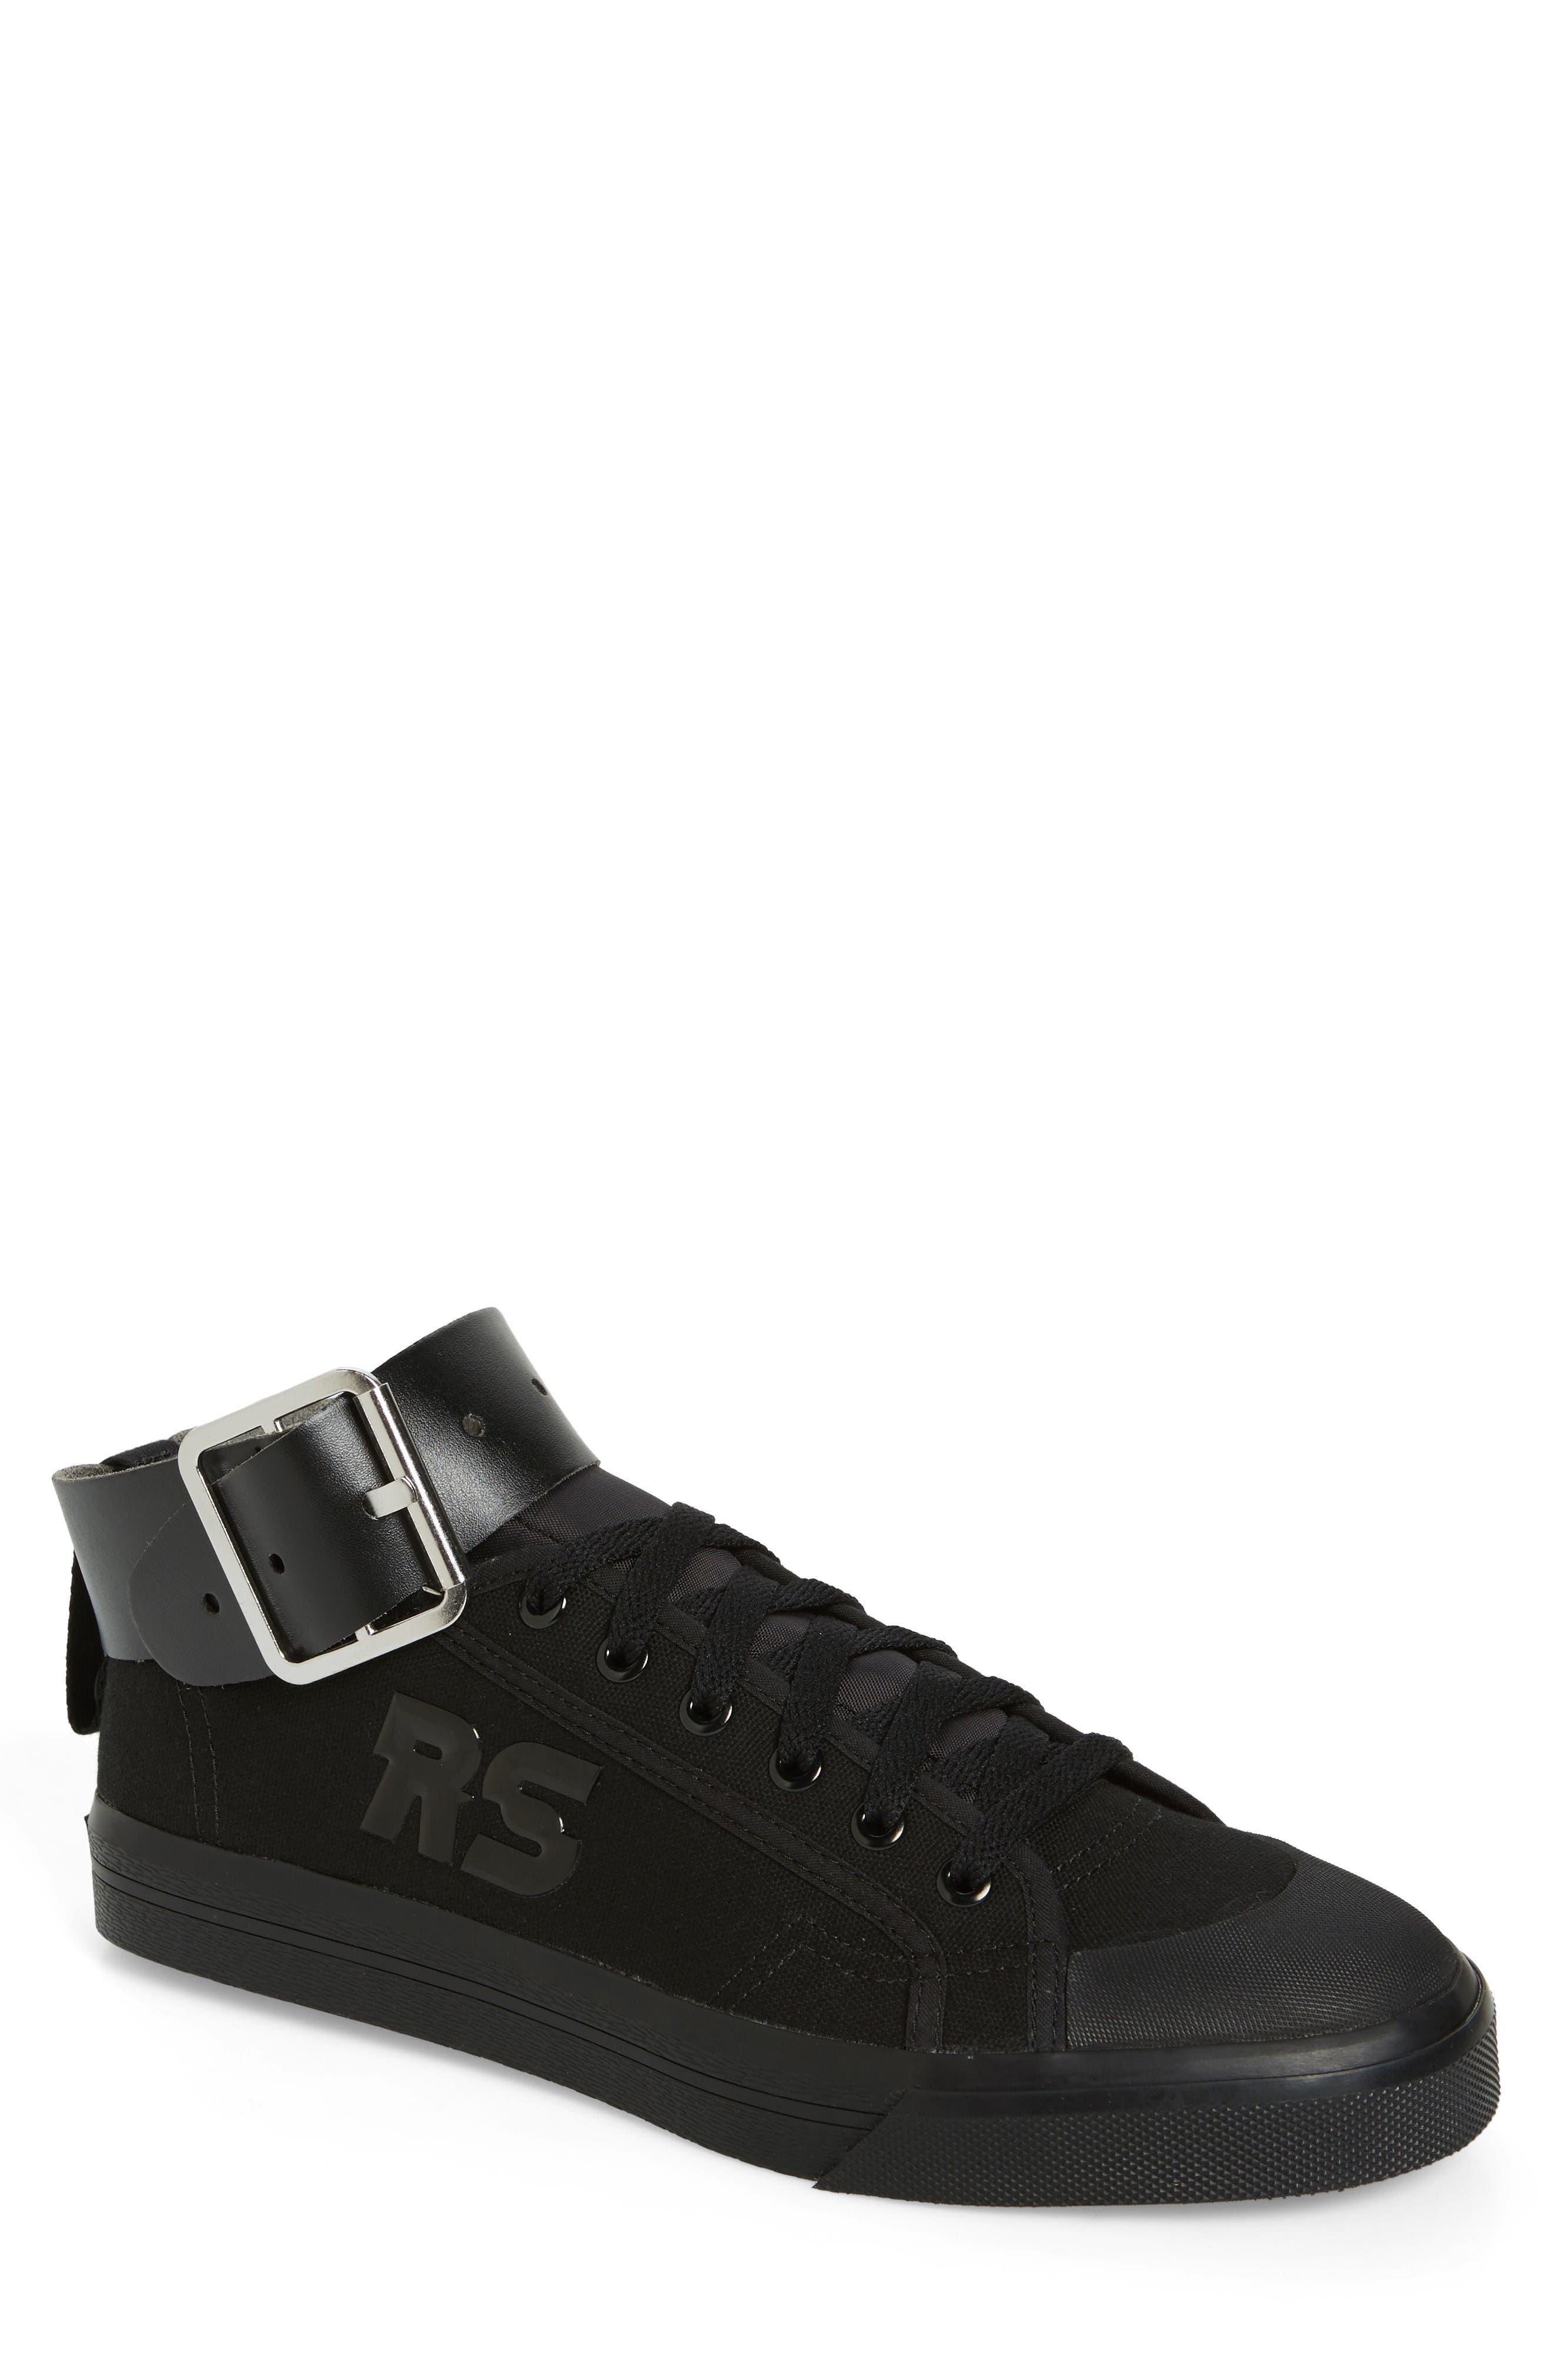 Main Image - adidas by Raf Simons Spirit Ankle Strap Sneaker (Men)